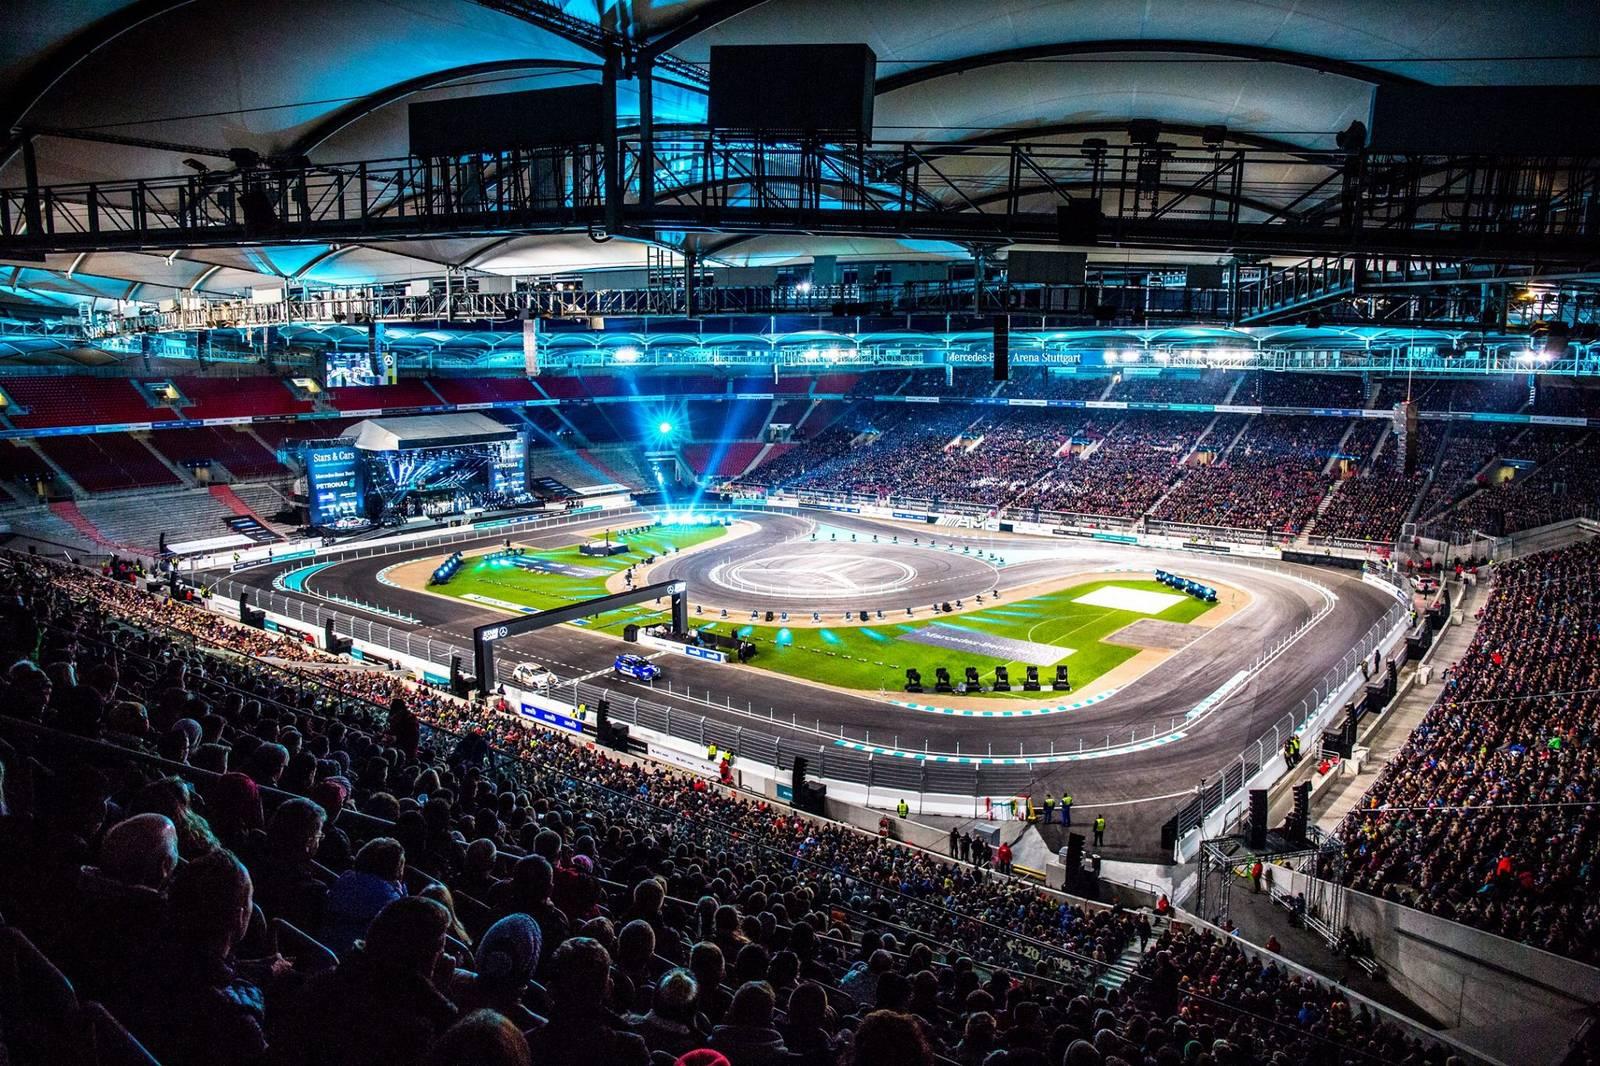 Stars cars 2015 rocks mercedes benz arena in stuttgart for Mercedes benz arena